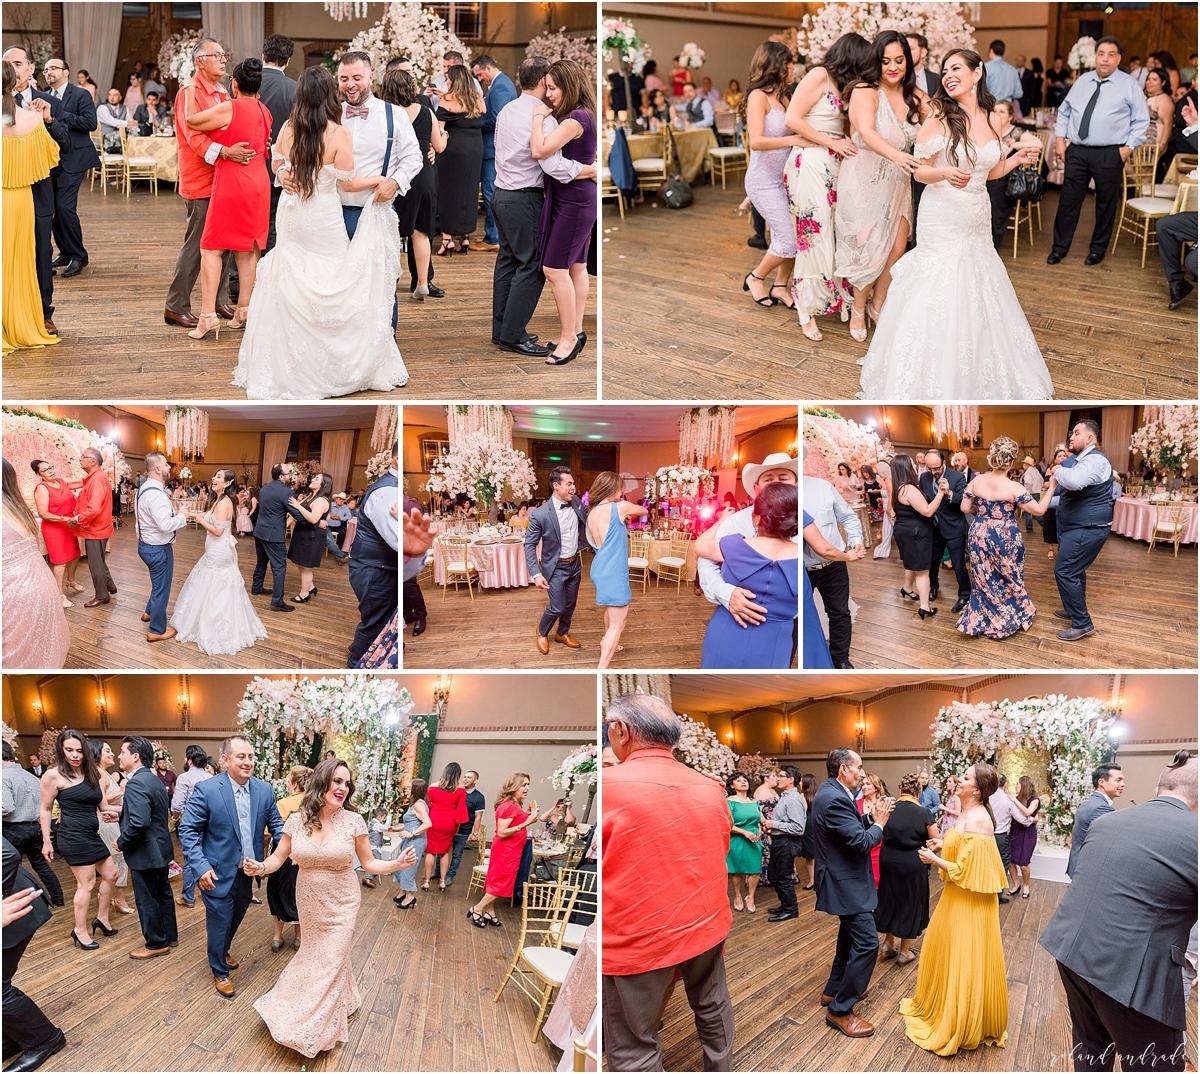 Rancho Los Guzman Wedding Joliet, Joliet Wedding, Joliet Wedding Photographer, Chicago Wedding Photographer, Best Photographer In Joliet, Best Photographer In Chicago, Light And Airy Photographer Chicago_0085.jpg